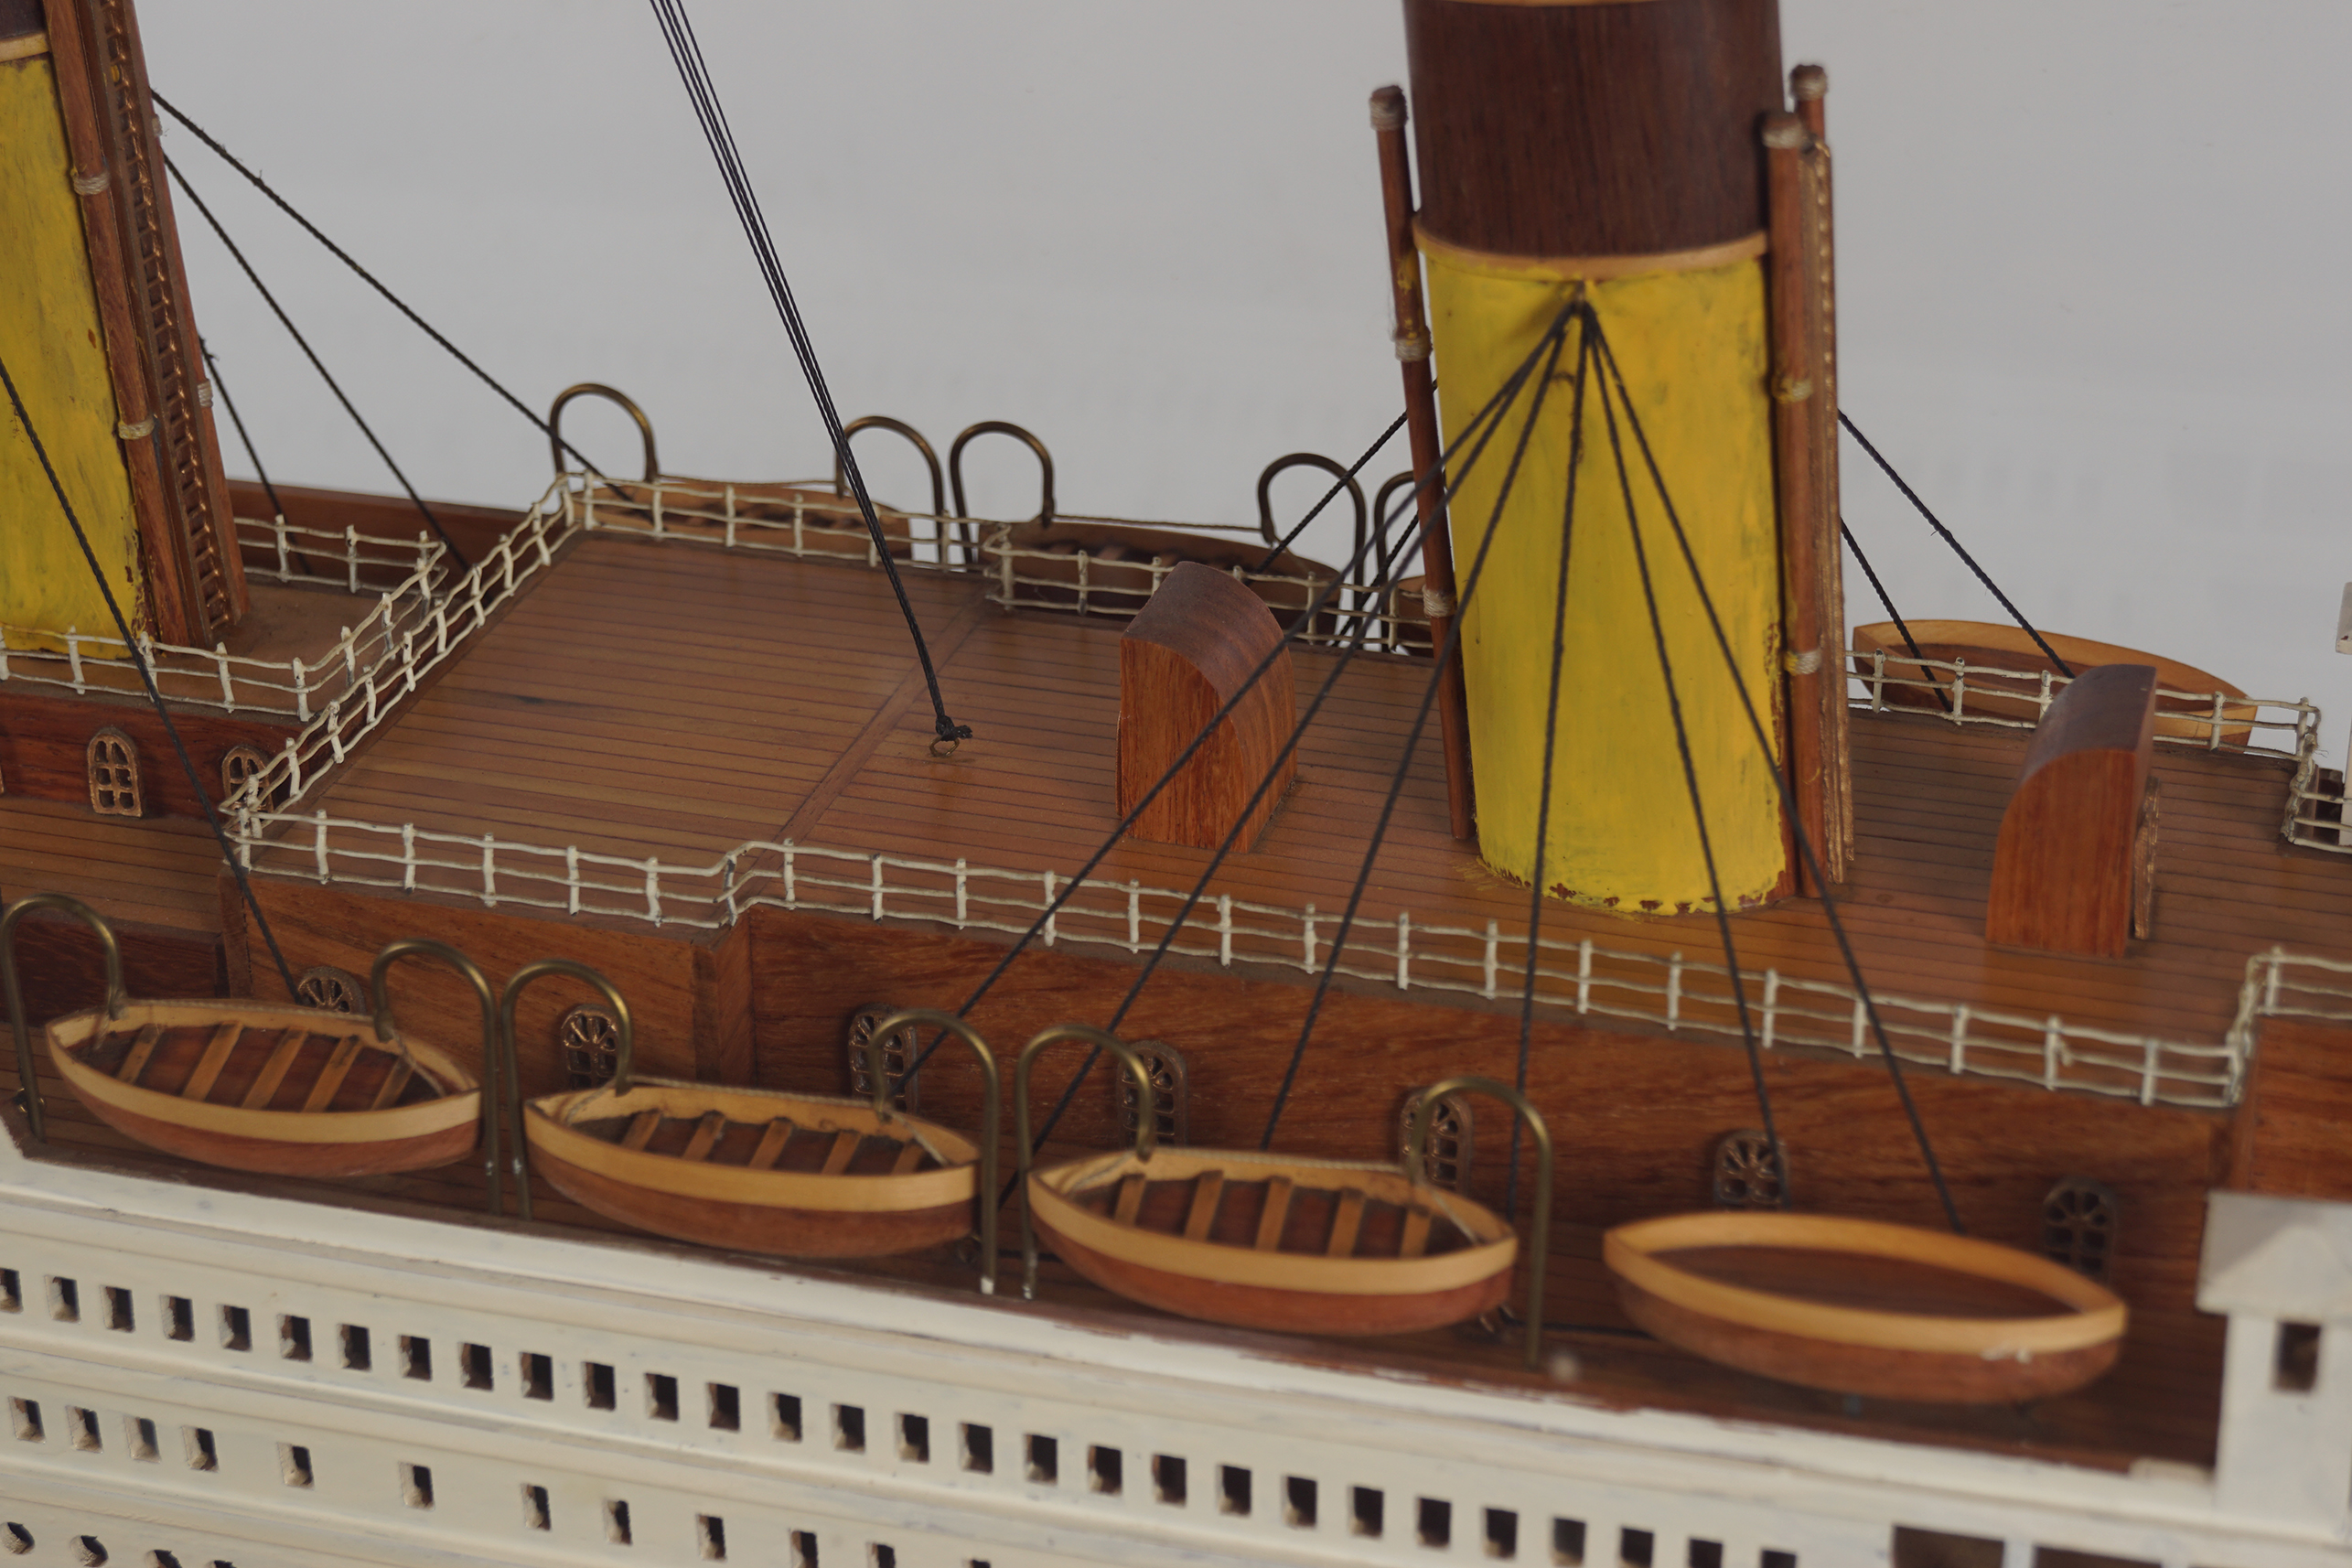 LARGE MODEL STEAM SHIP - Image 4 of 8